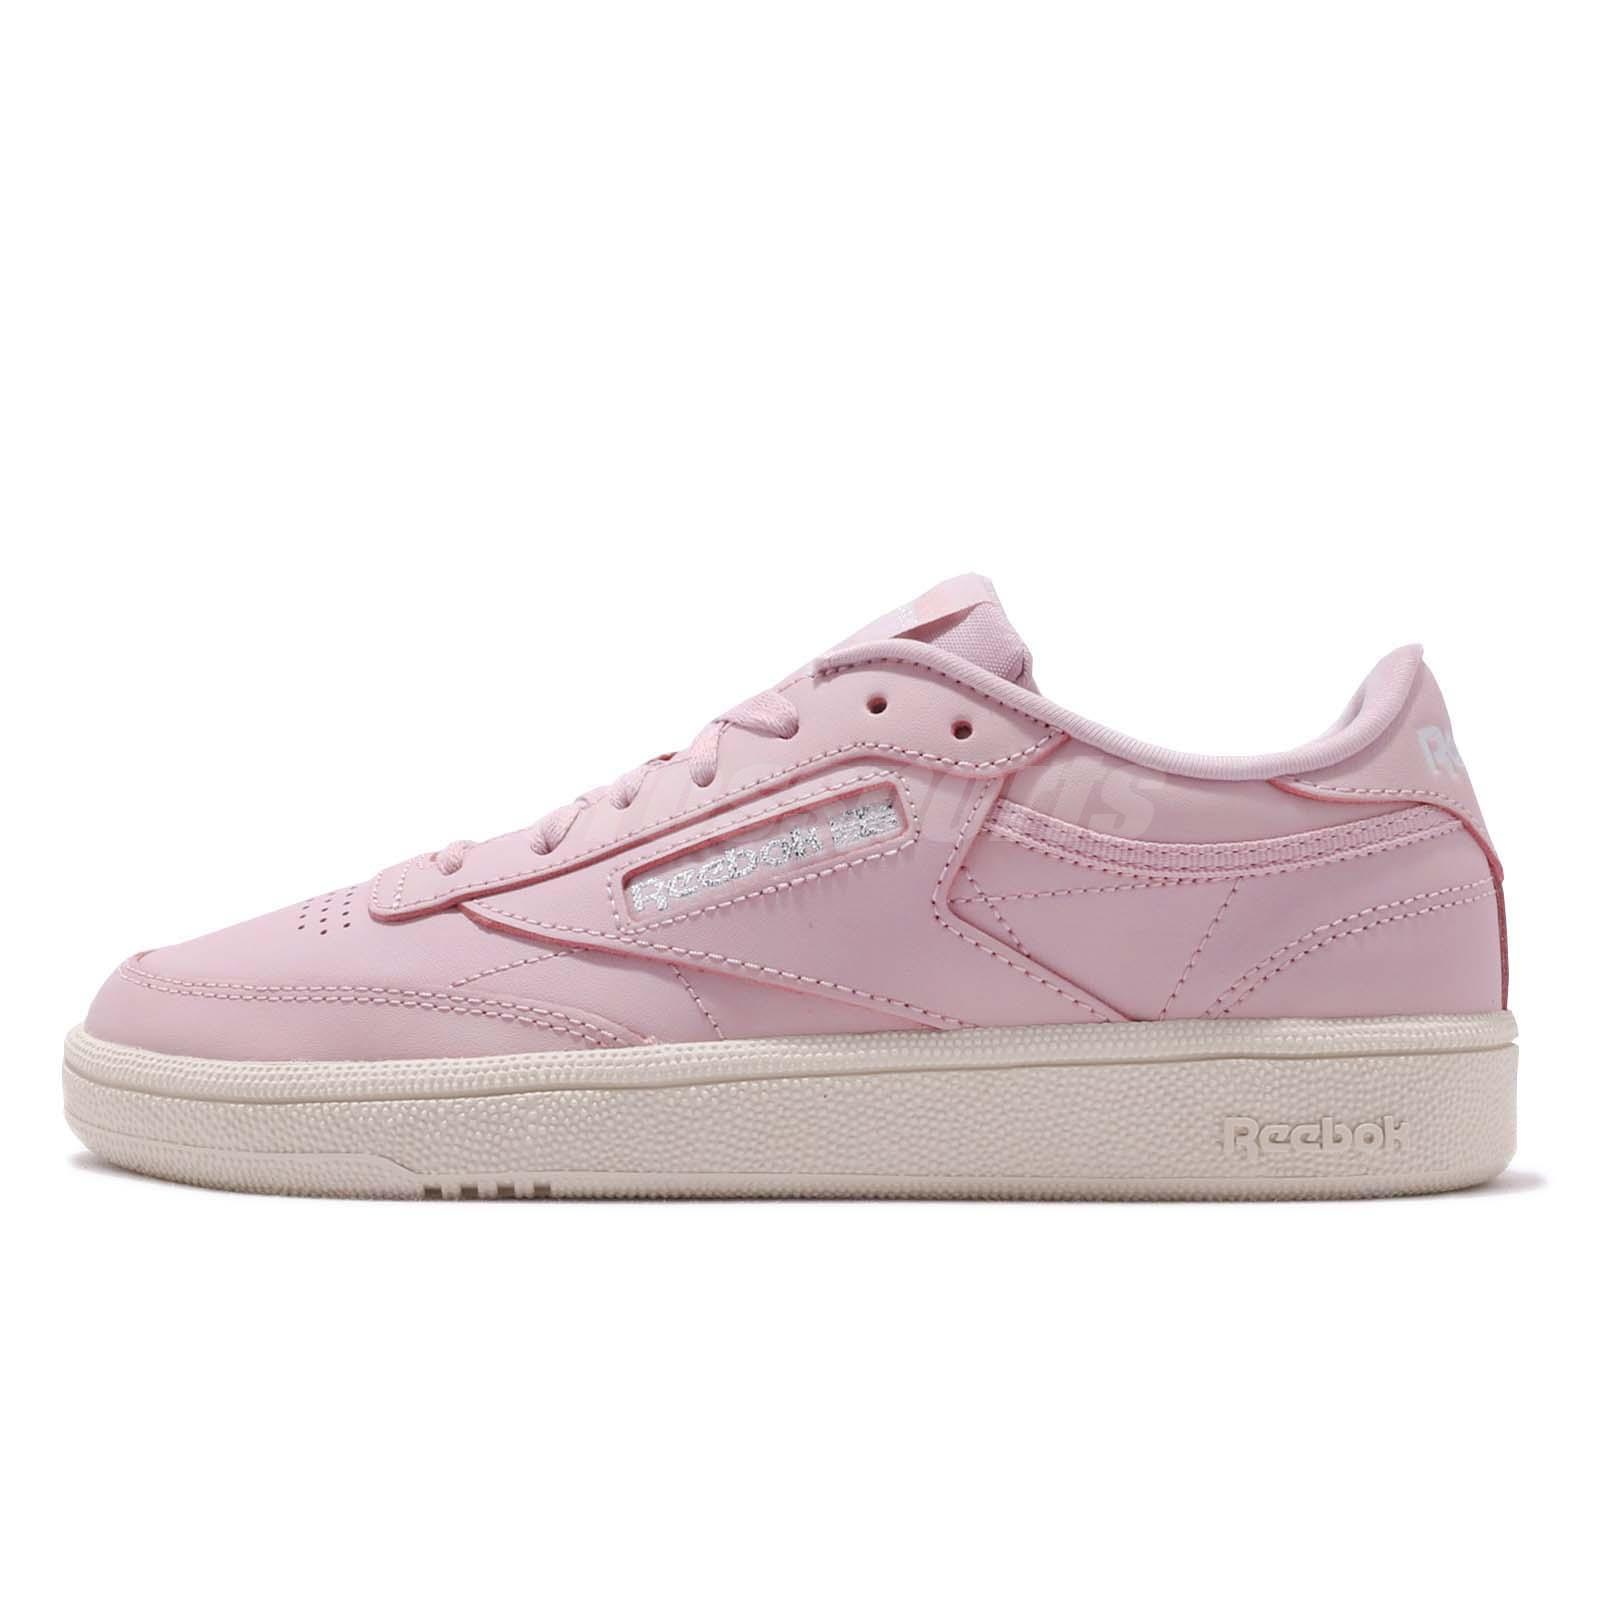 ecaf6d038f6b Reebok Club C 85 Ashen Lilac Silver Women Classic Casual Shoes Sneakers  DV3728